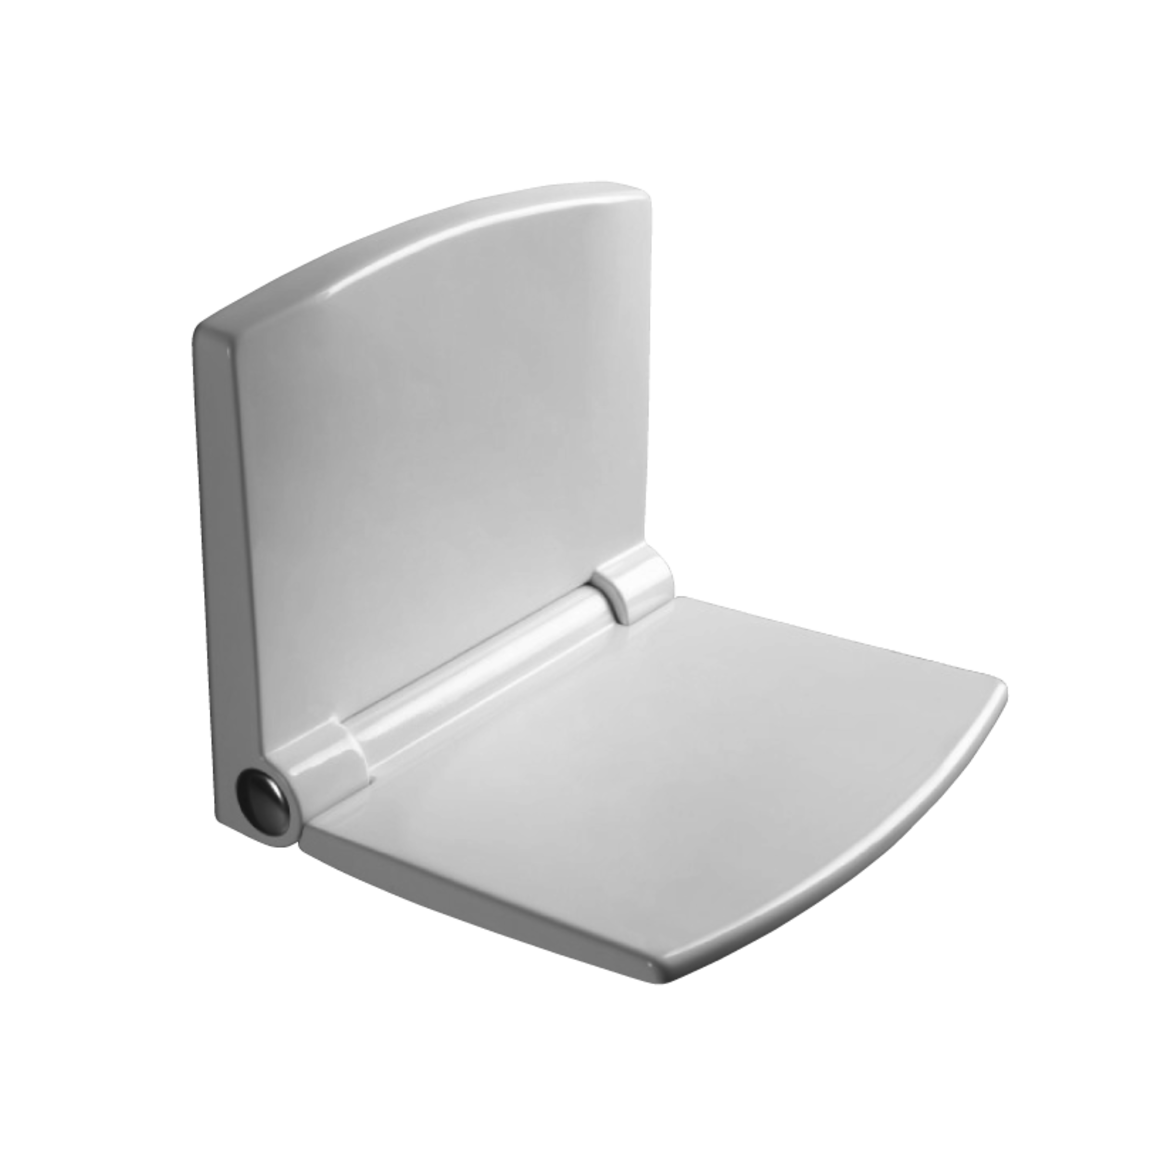 barrierefrei bad wuh24 online shop f r bad k che heizung und installation. Black Bedroom Furniture Sets. Home Design Ideas